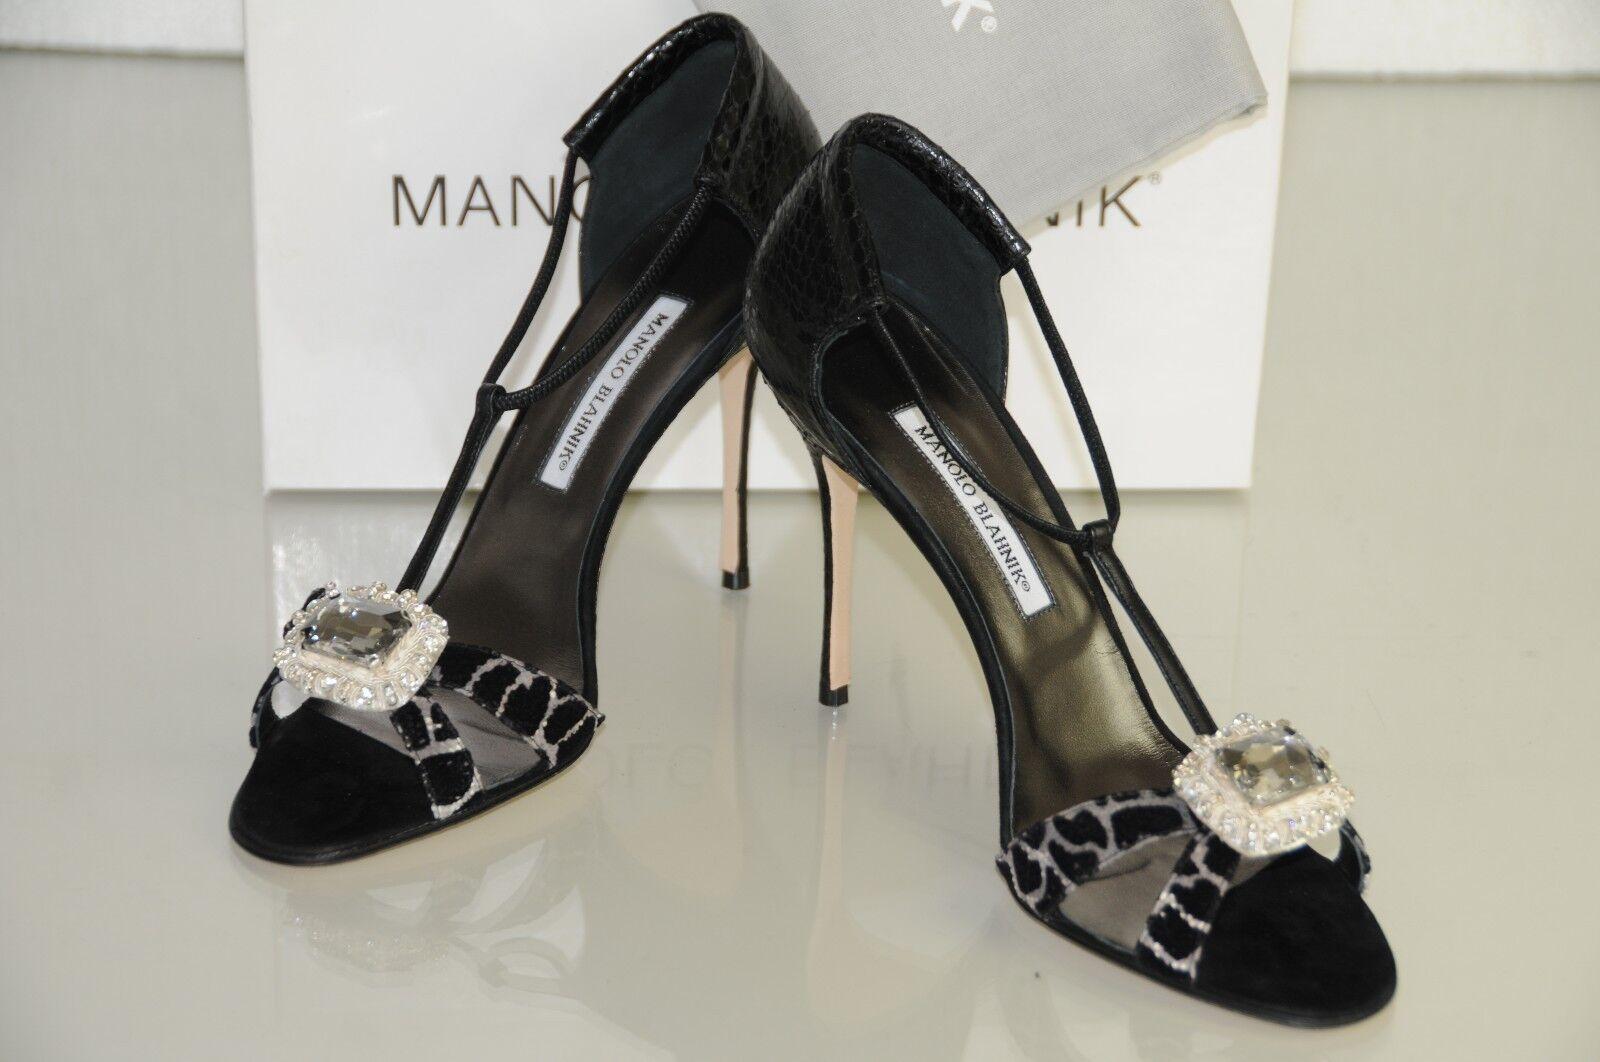 New Manolo Blahnik Drina Black Snake Skins Jeweled shoes Pumps Heels 40.5 10